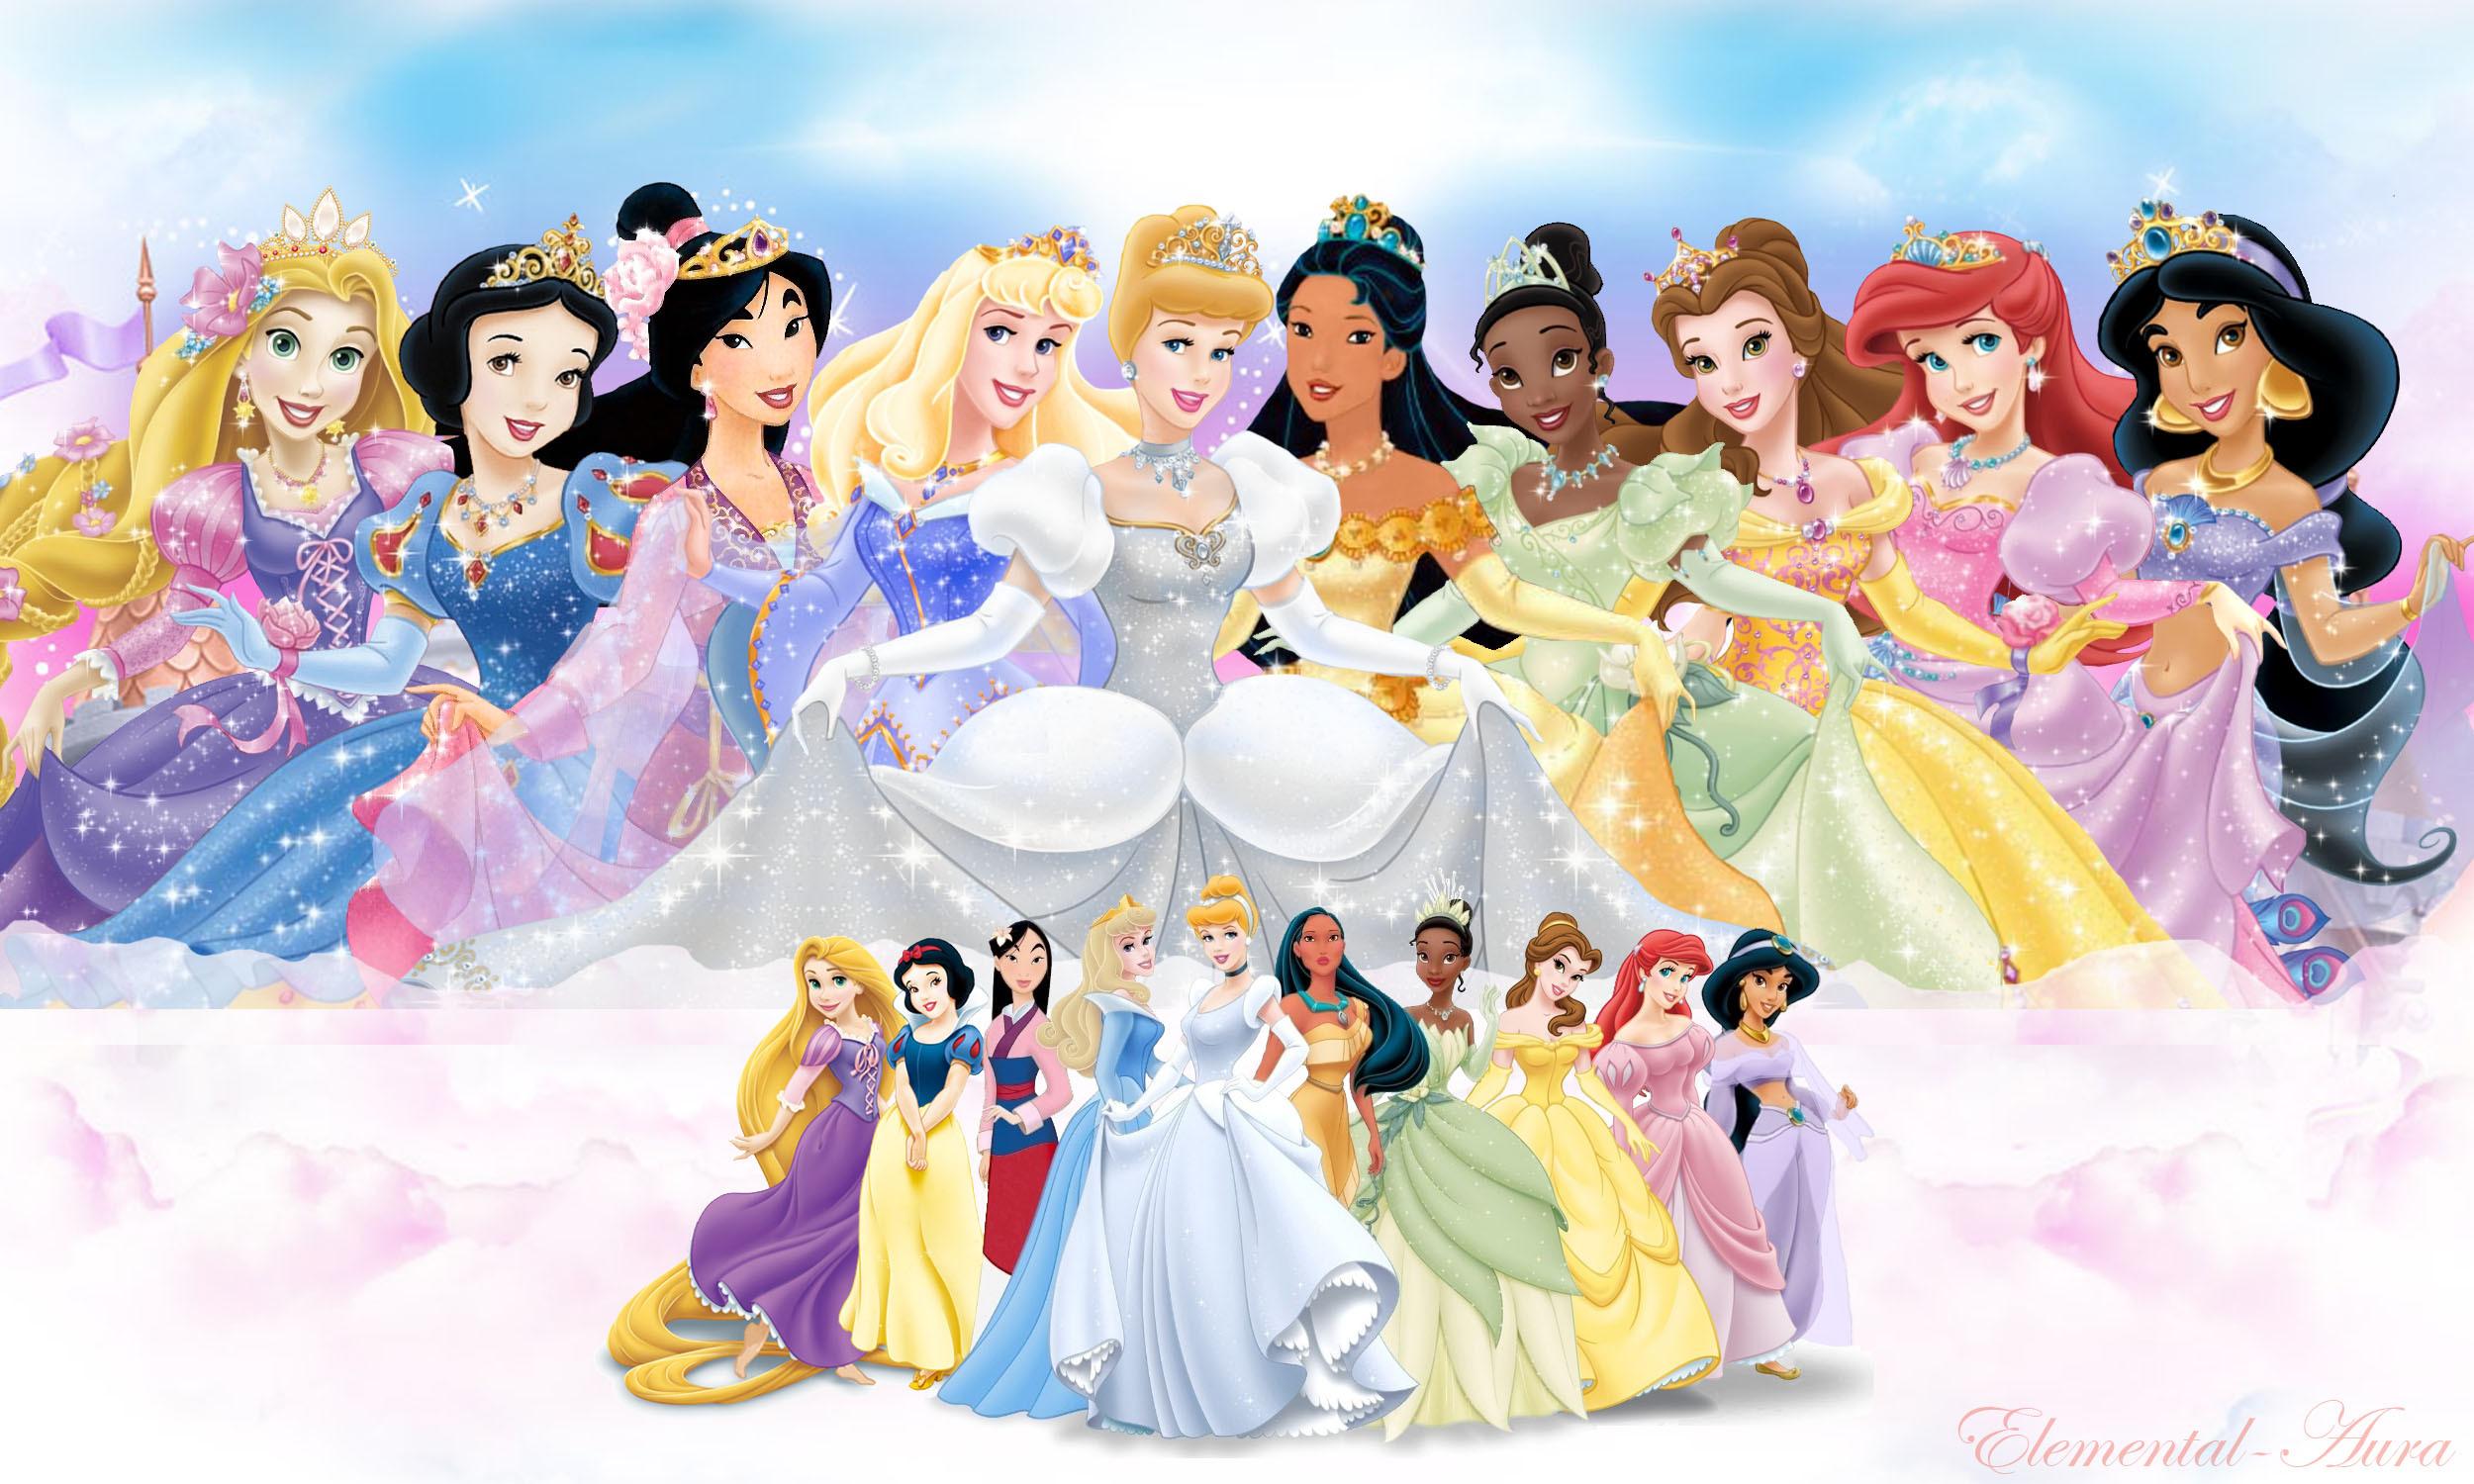 Disney Characters Wallpaper hd wallpaper background desktop 2500x1500